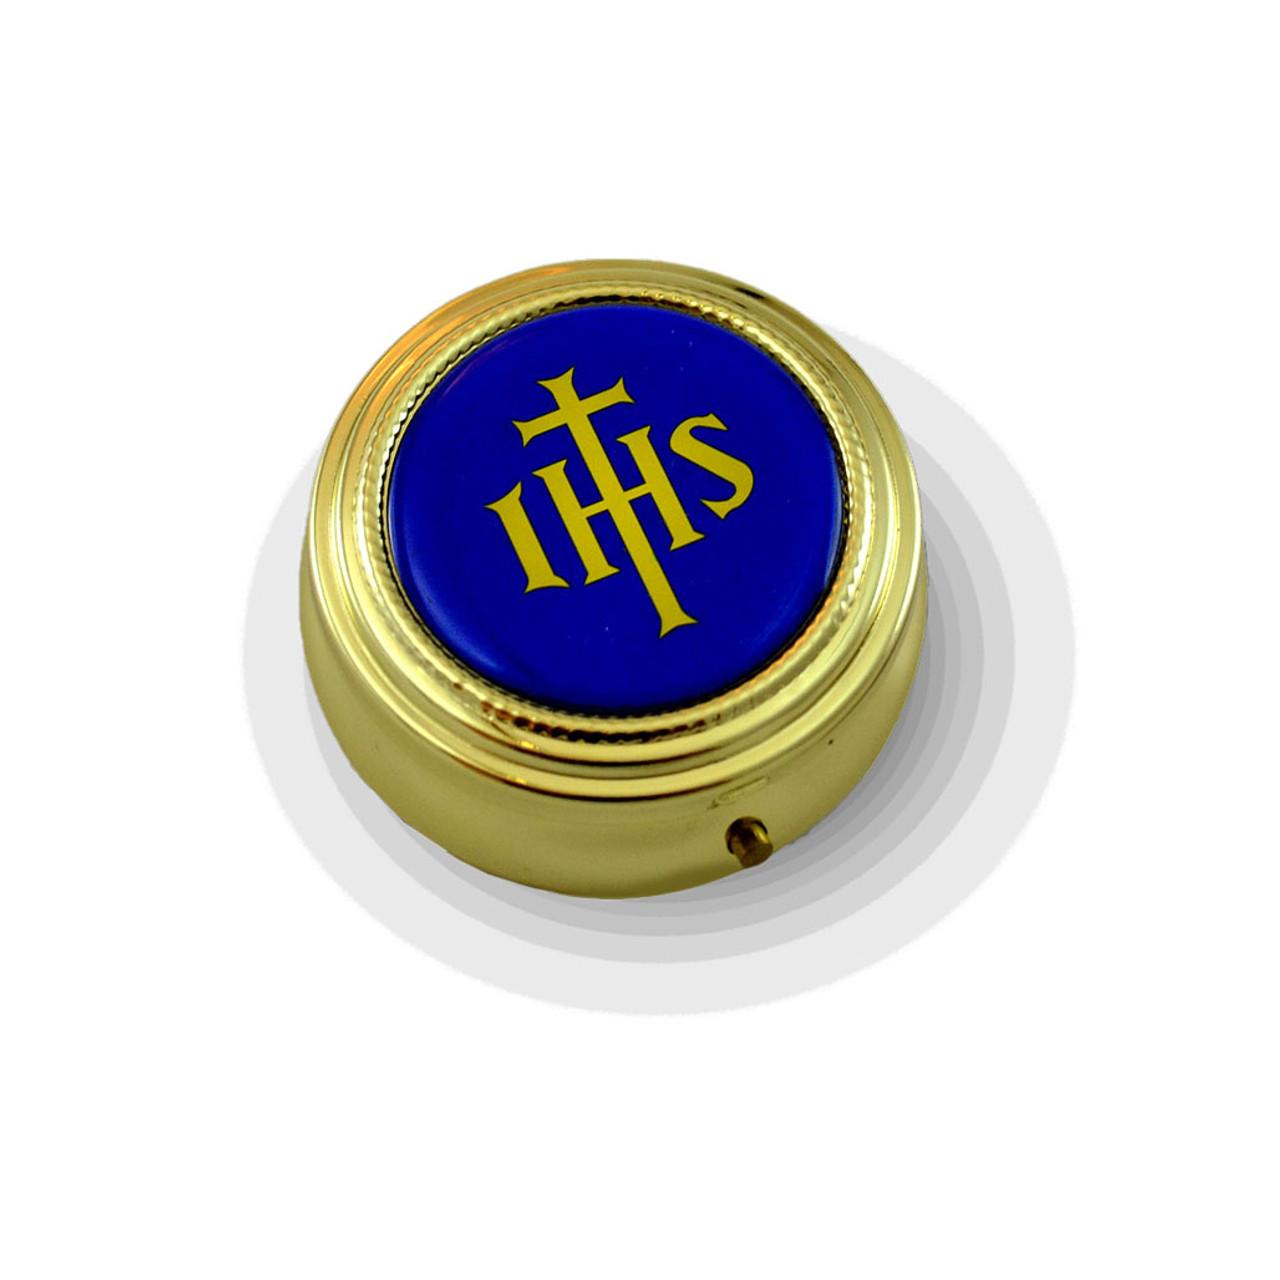 CS IHS Pyx Small Size 5-8 Hosts